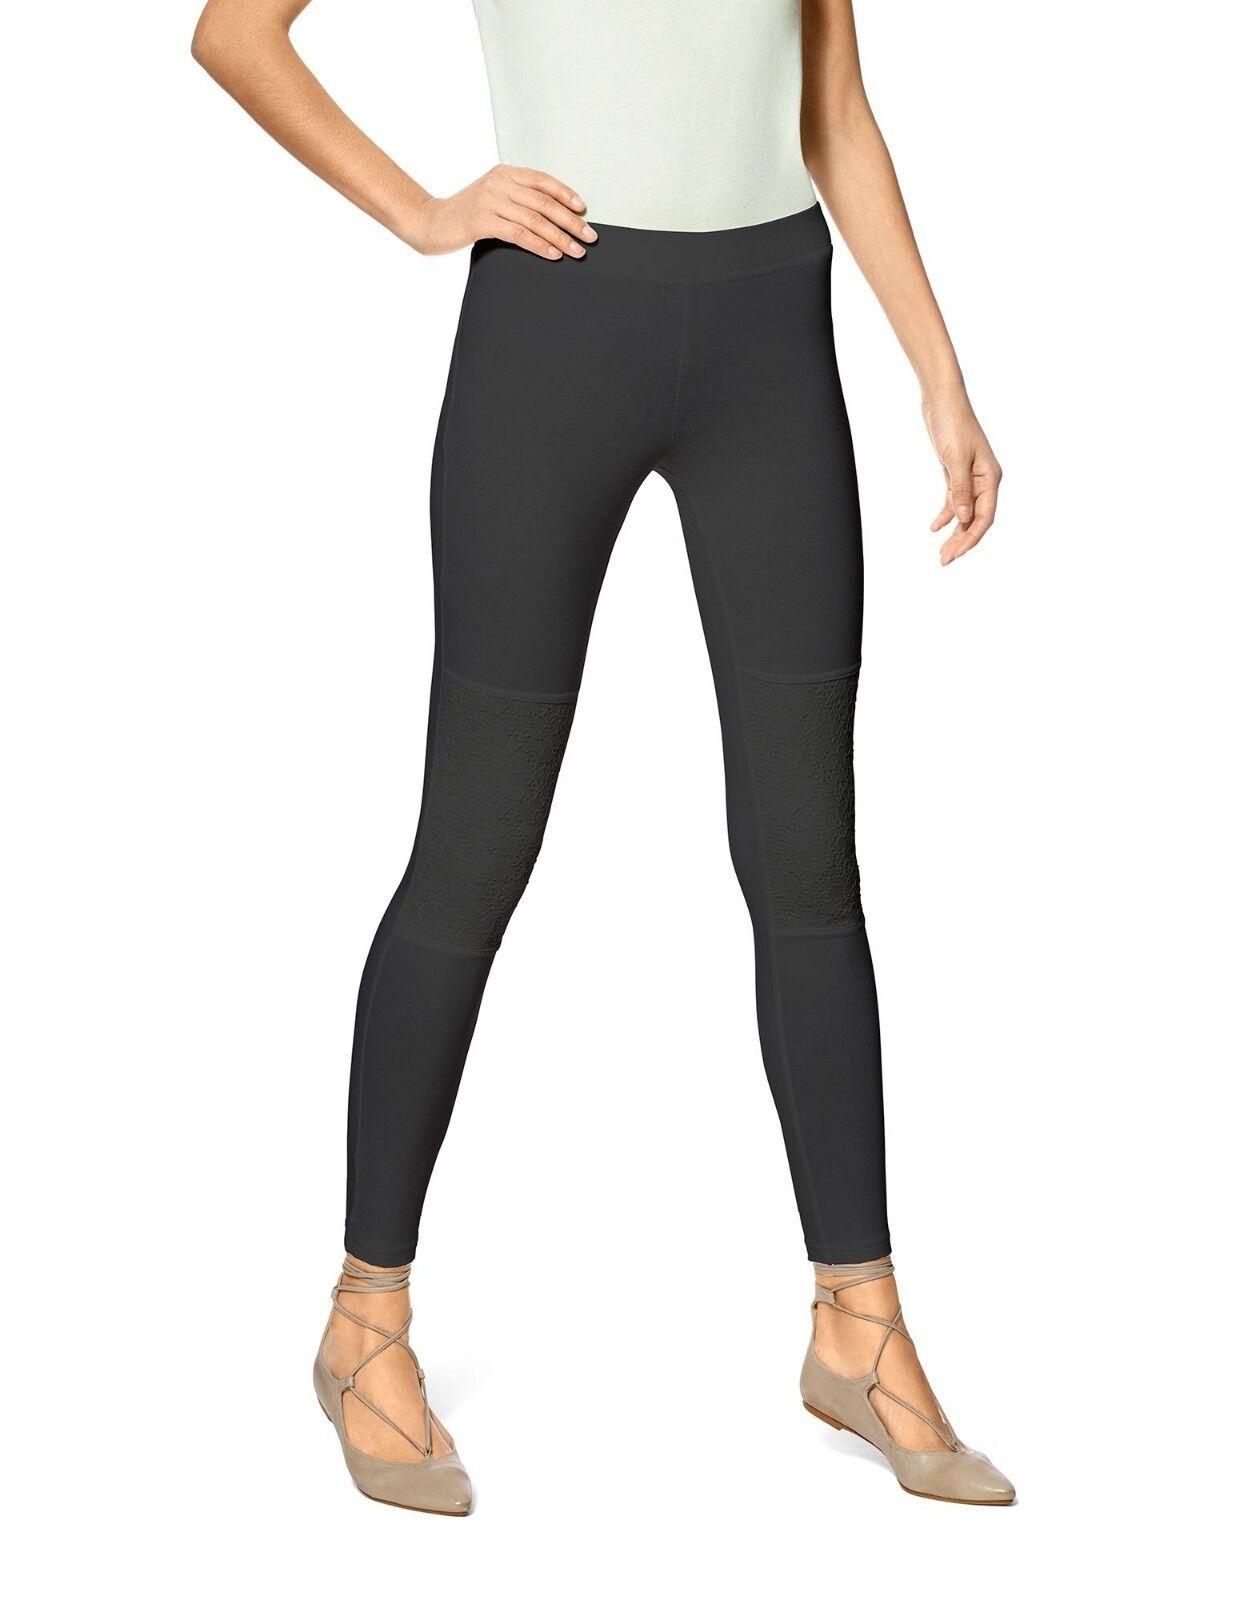 ca45966d879da7 Hue Leggings Sz S Solid Black Lace Knee Cotton Casual Legging 79001 ...